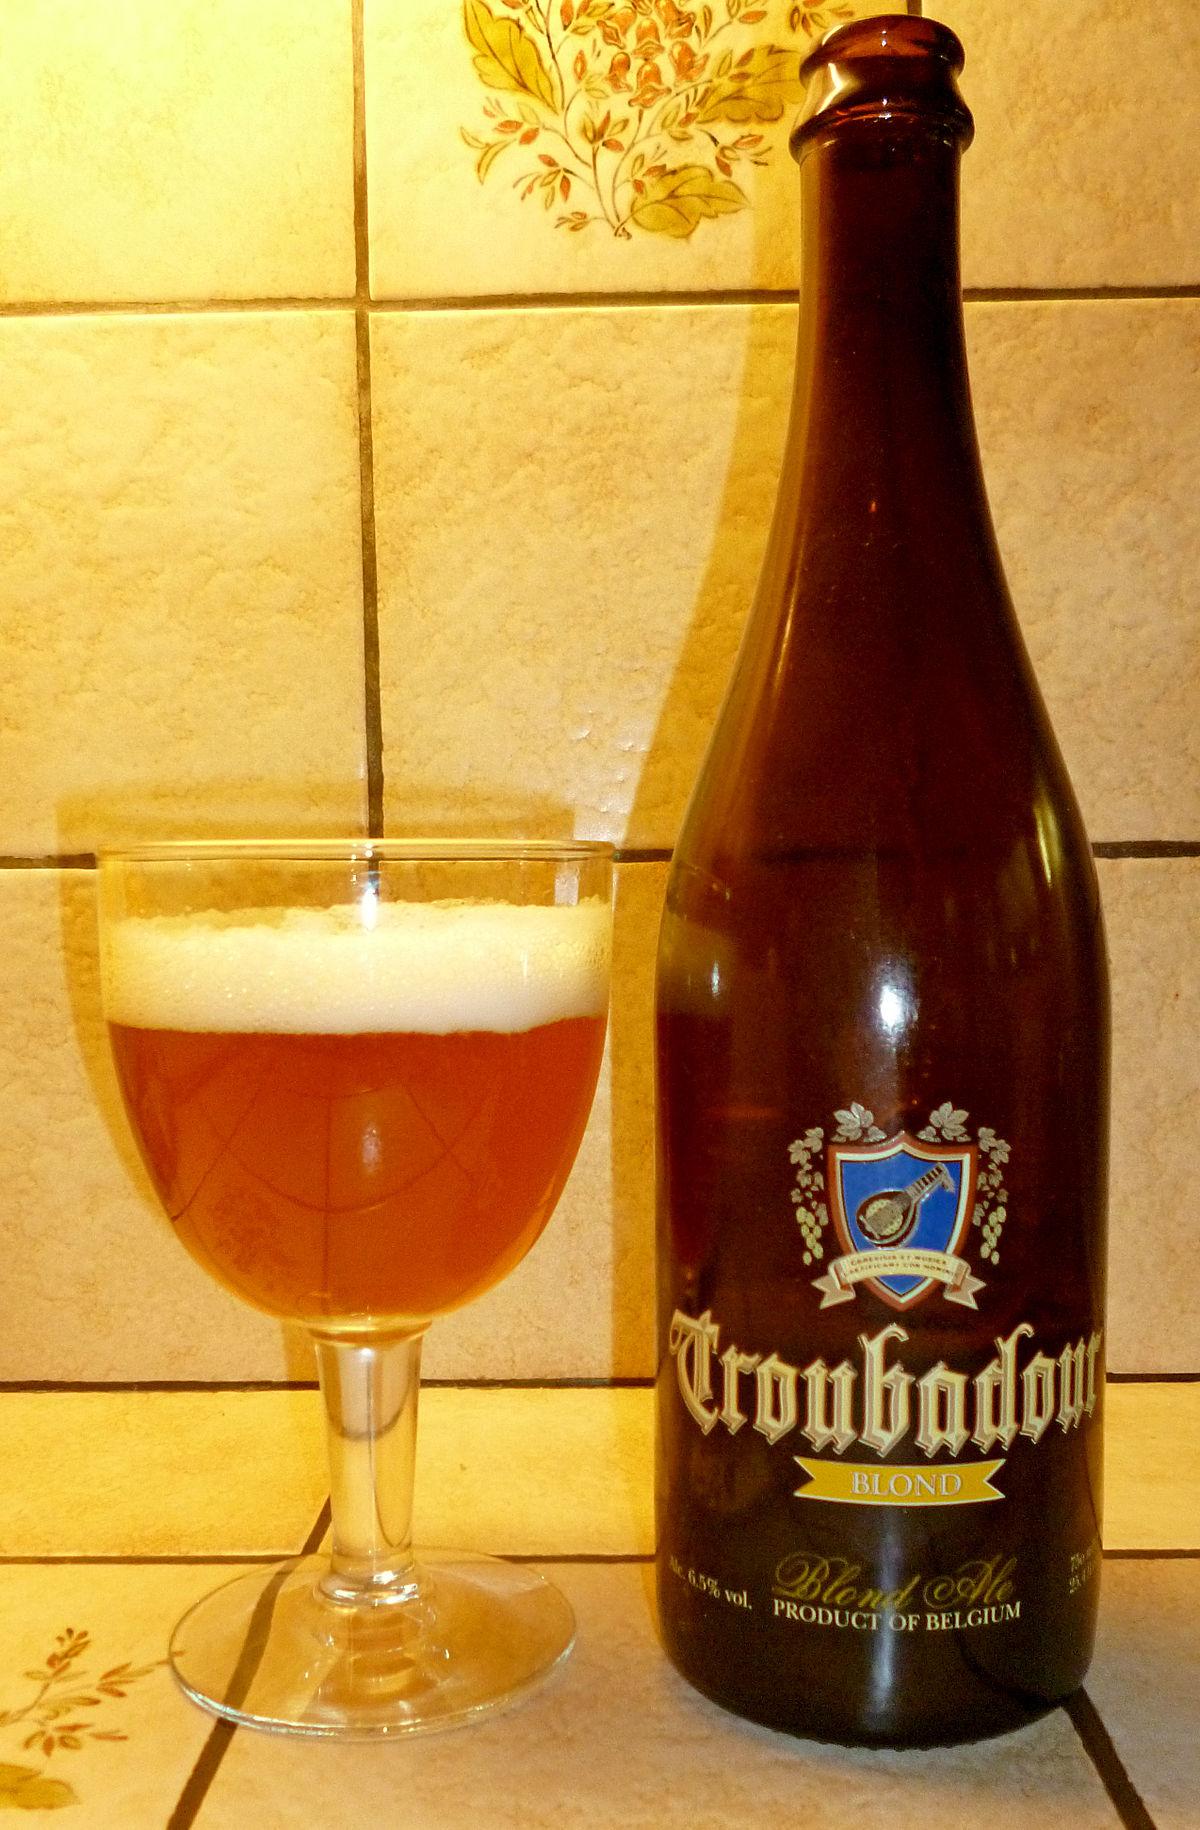 Traditional Mauritian drinks, Mauritius drinks, traditional drinks in Mauritius, Mauritian drinks, trobadour blond